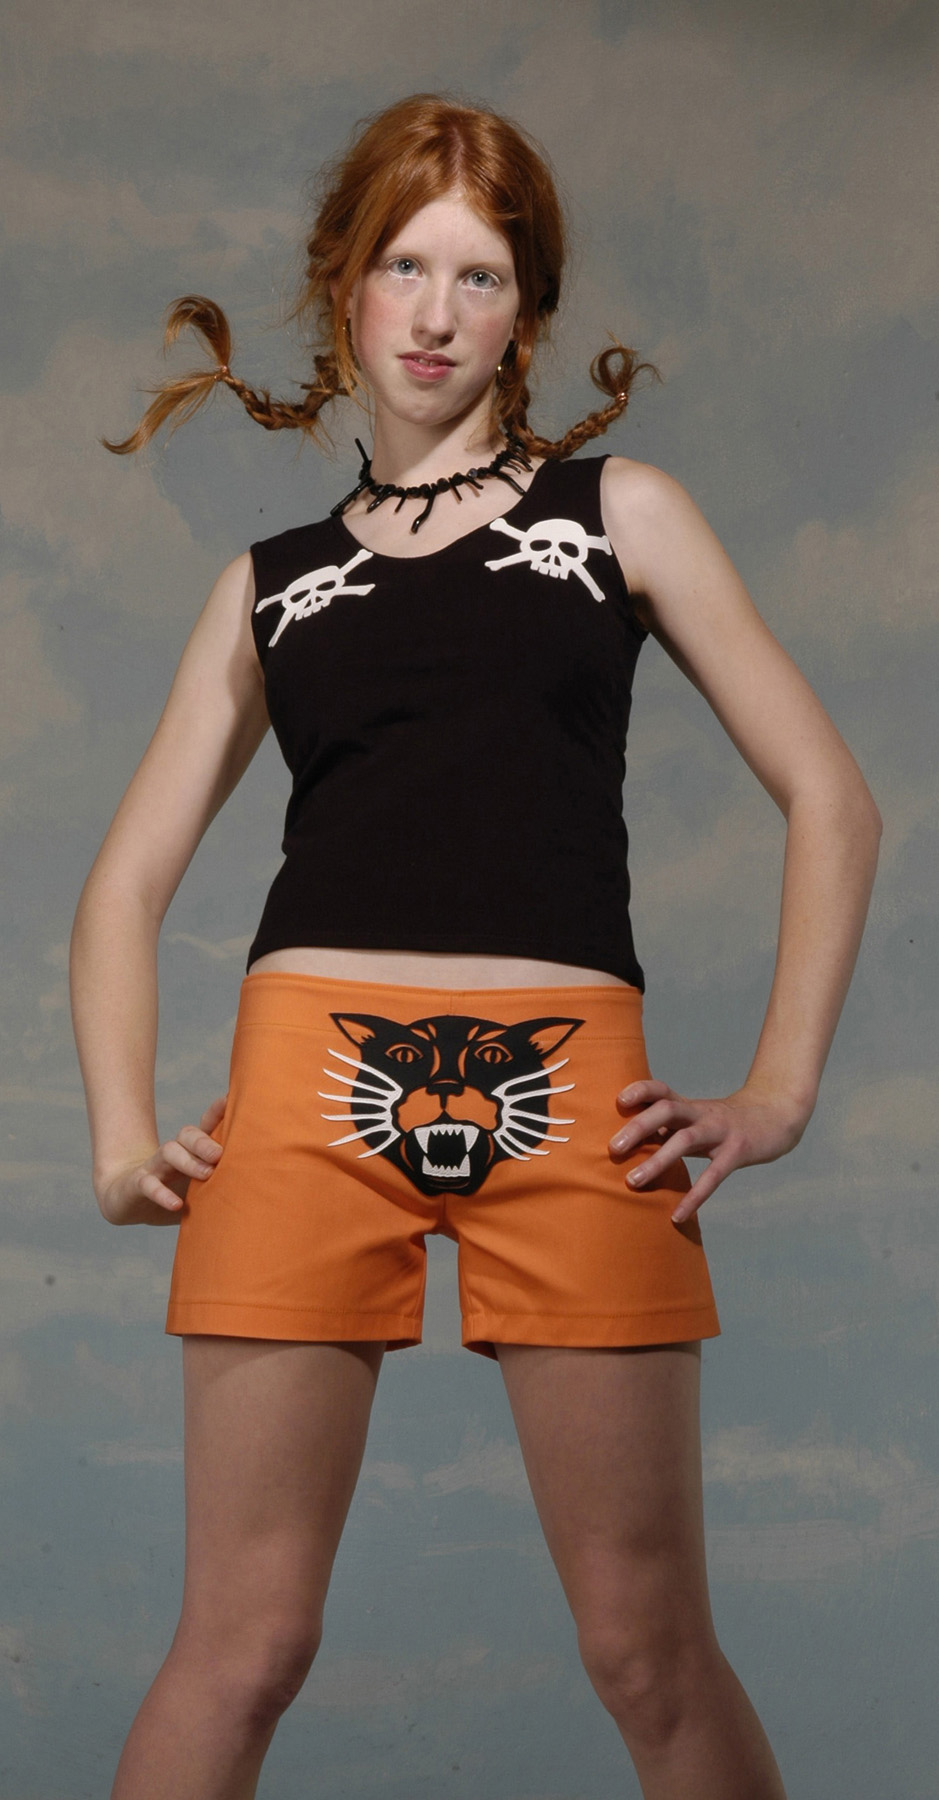 wildcat shorts and skull & crossbones top